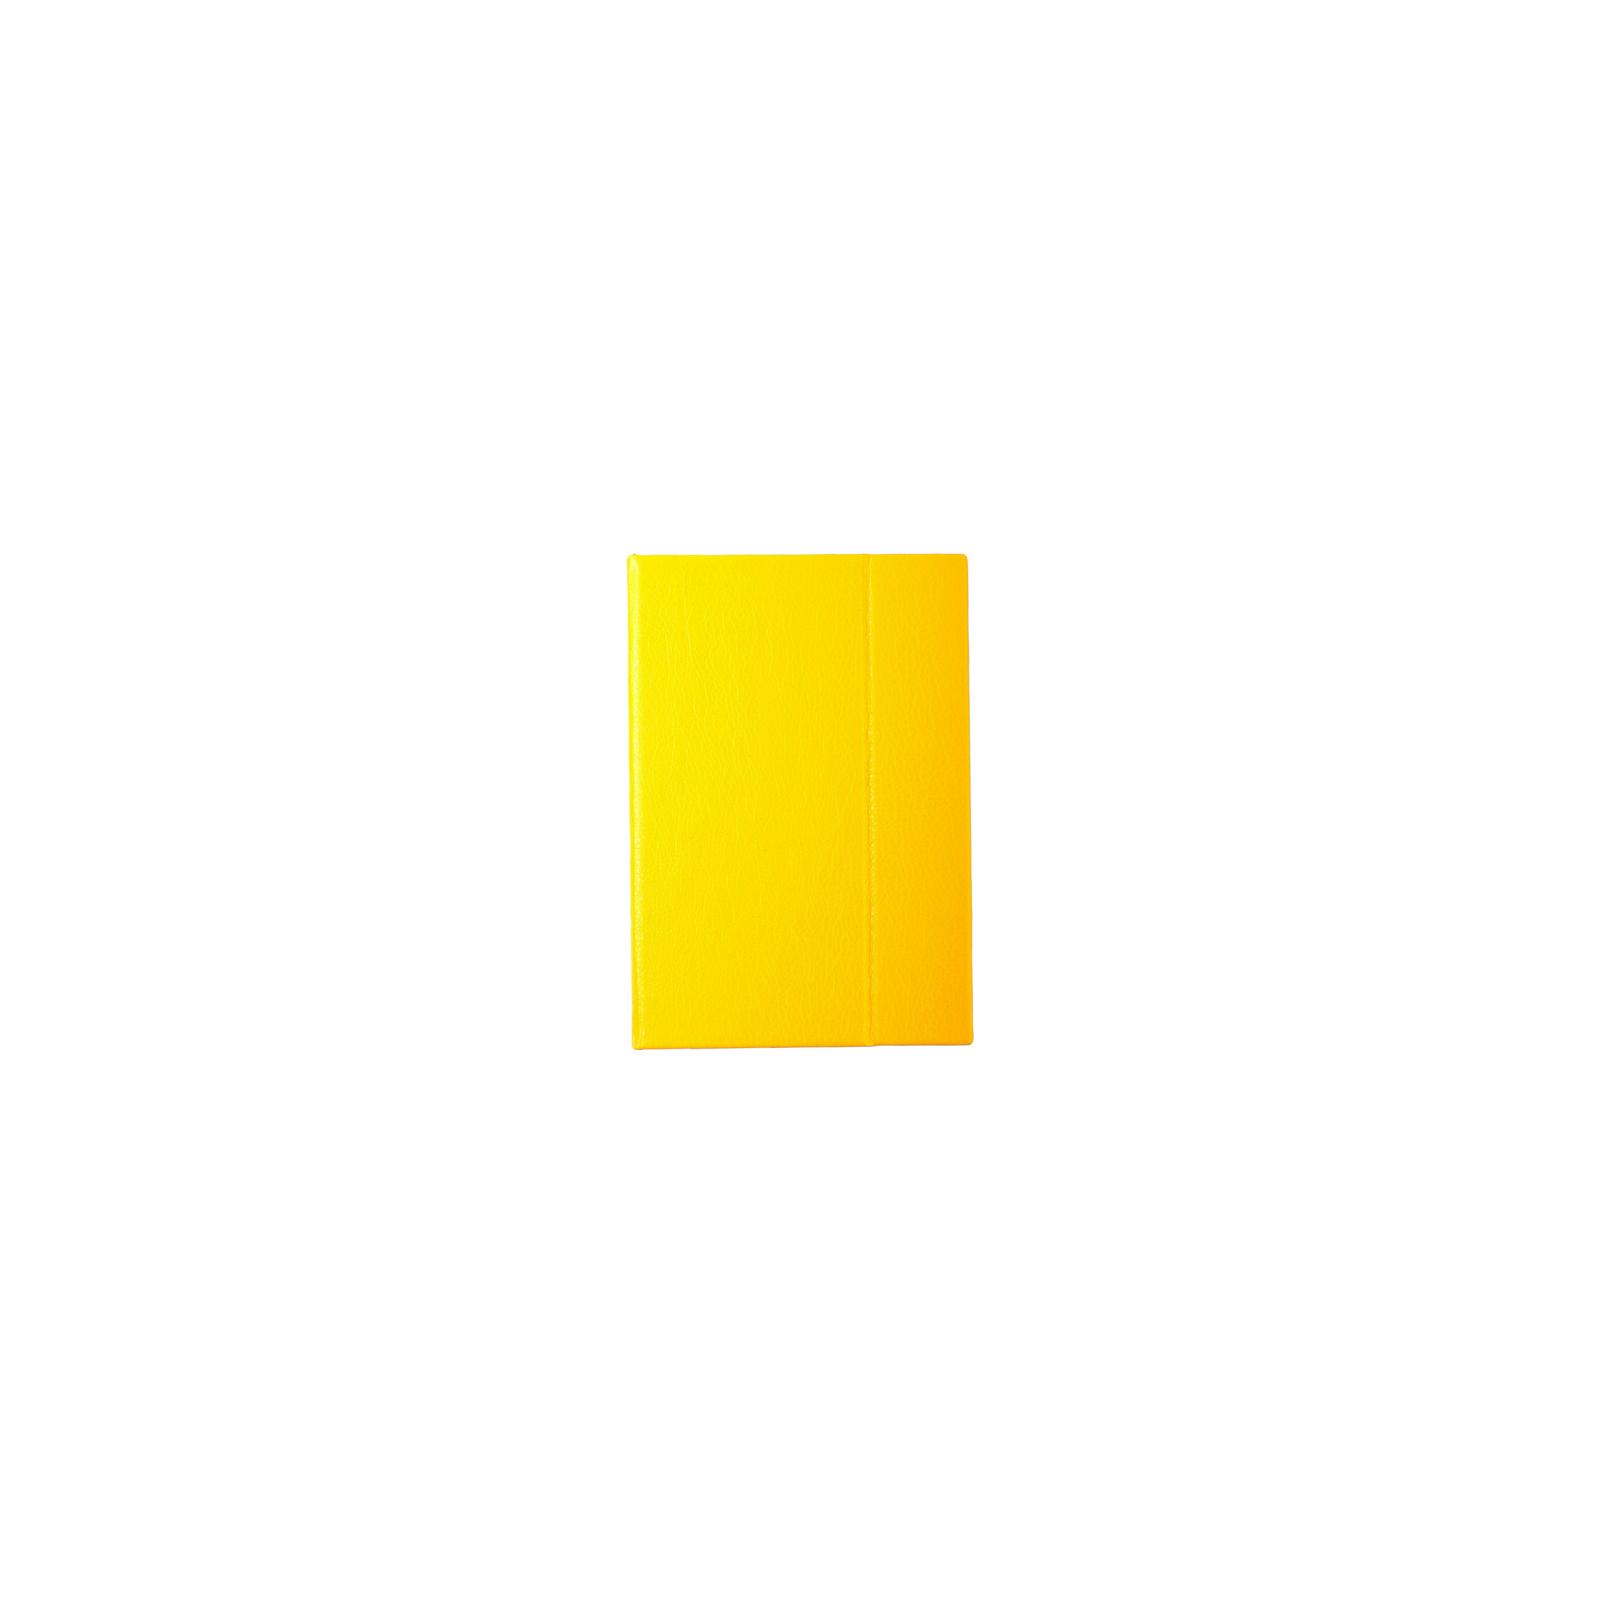 Чехол для планшета Vento 10.1 Desire Bright -yellow изображение 2